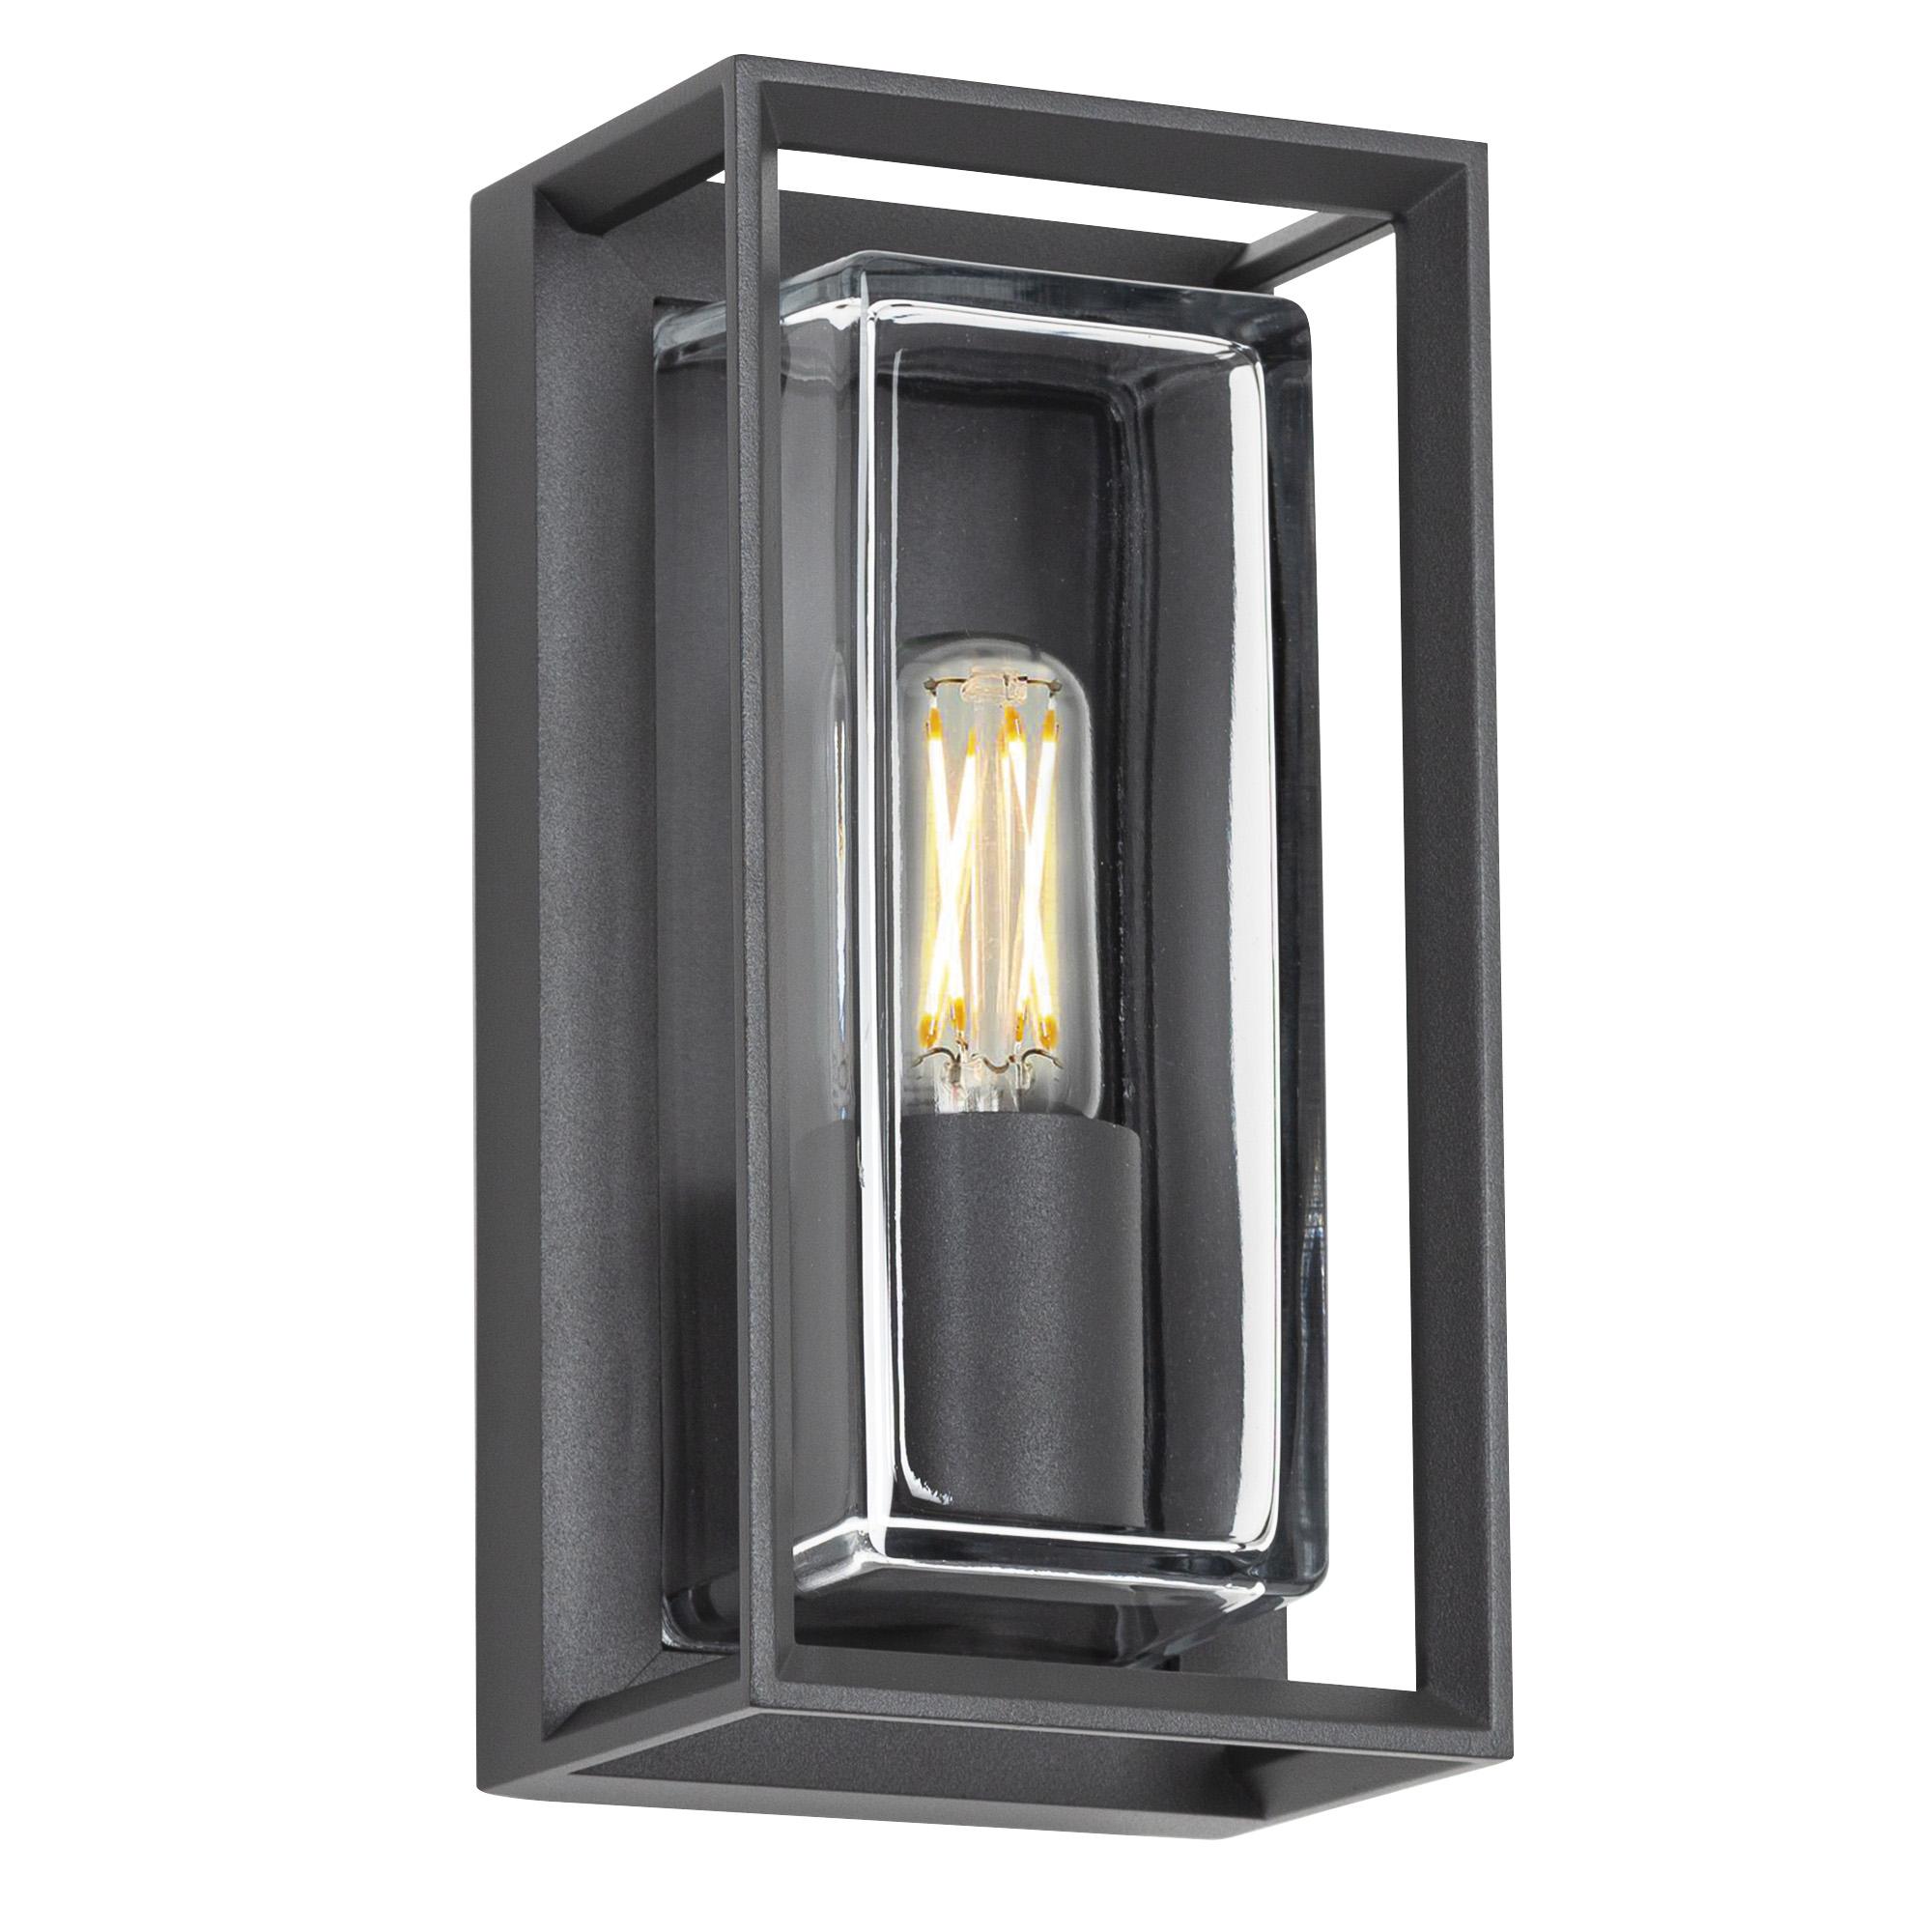 Buitenlamp Eaton Wandlamp Antraciet